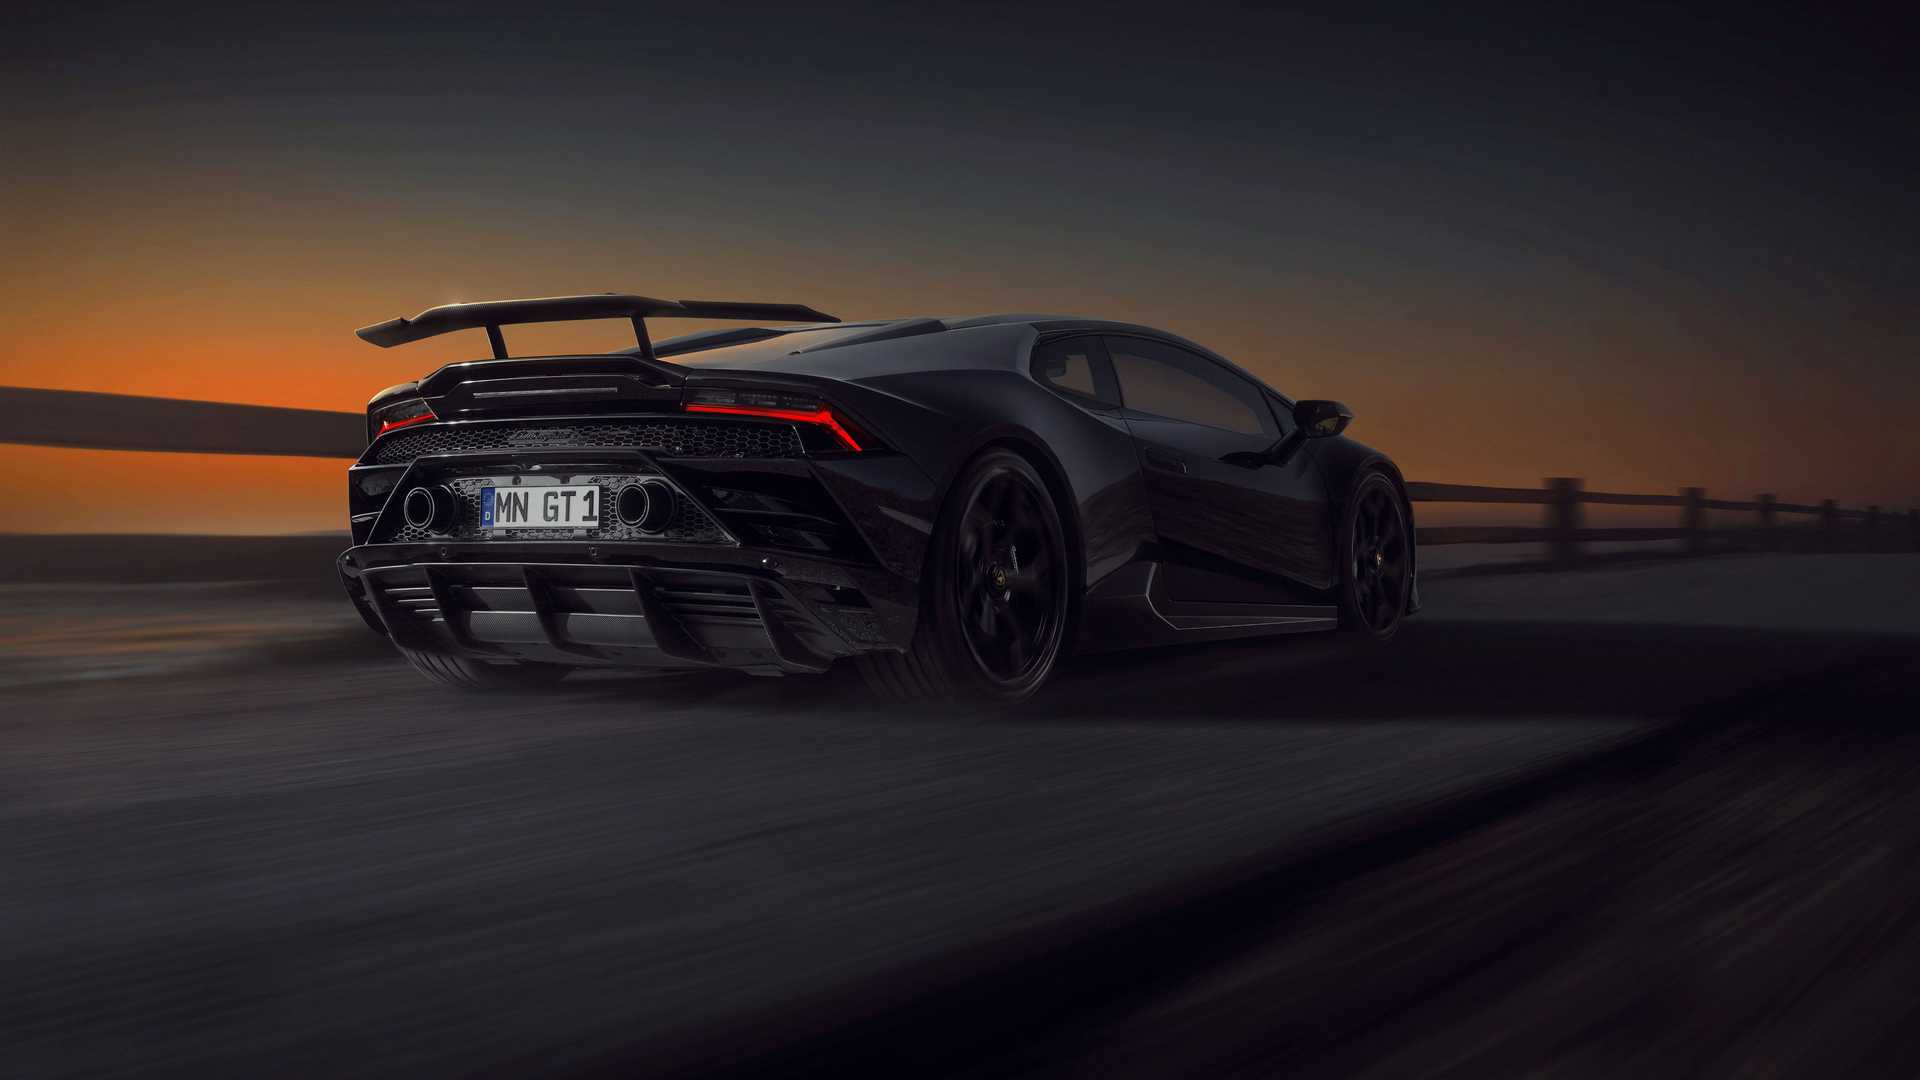 Lamborghini Huracan Evo By Novitec Rear View